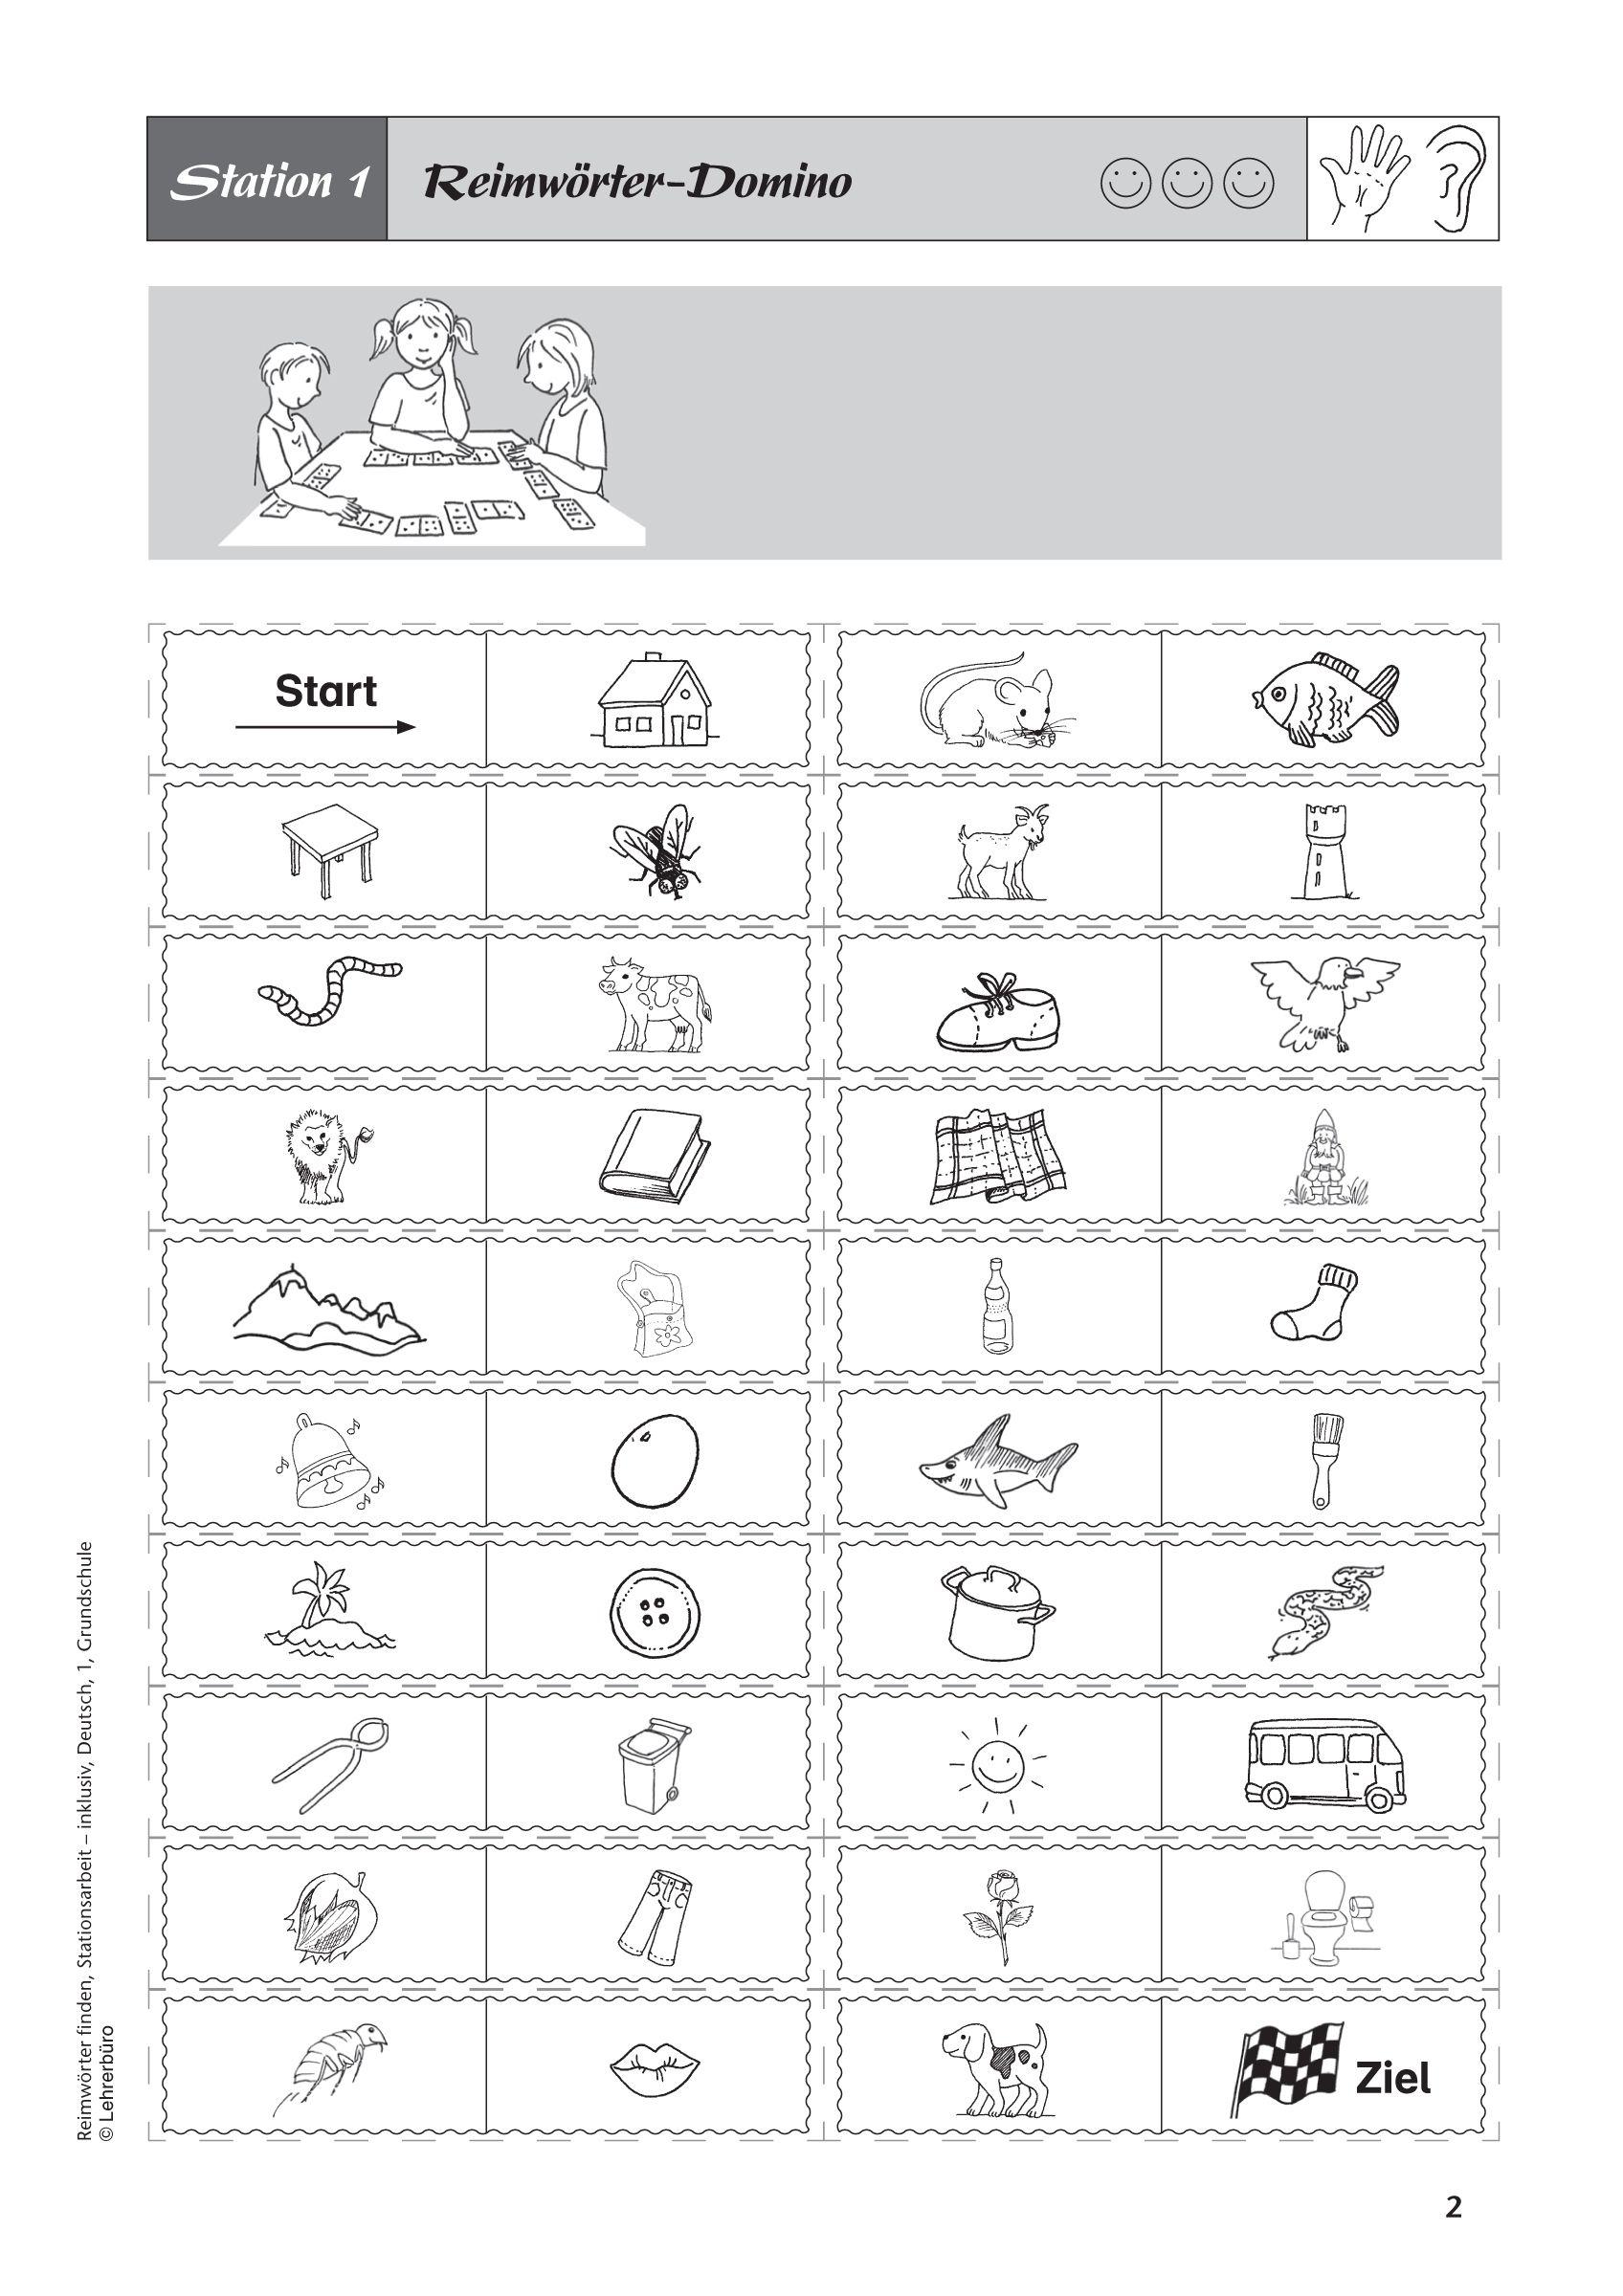 grundschule deutsch arbeitsbl tter arbeitsblatt vorschule arbeitsbl tter deutsch 1 klasse. Black Bedroom Furniture Sets. Home Design Ideas